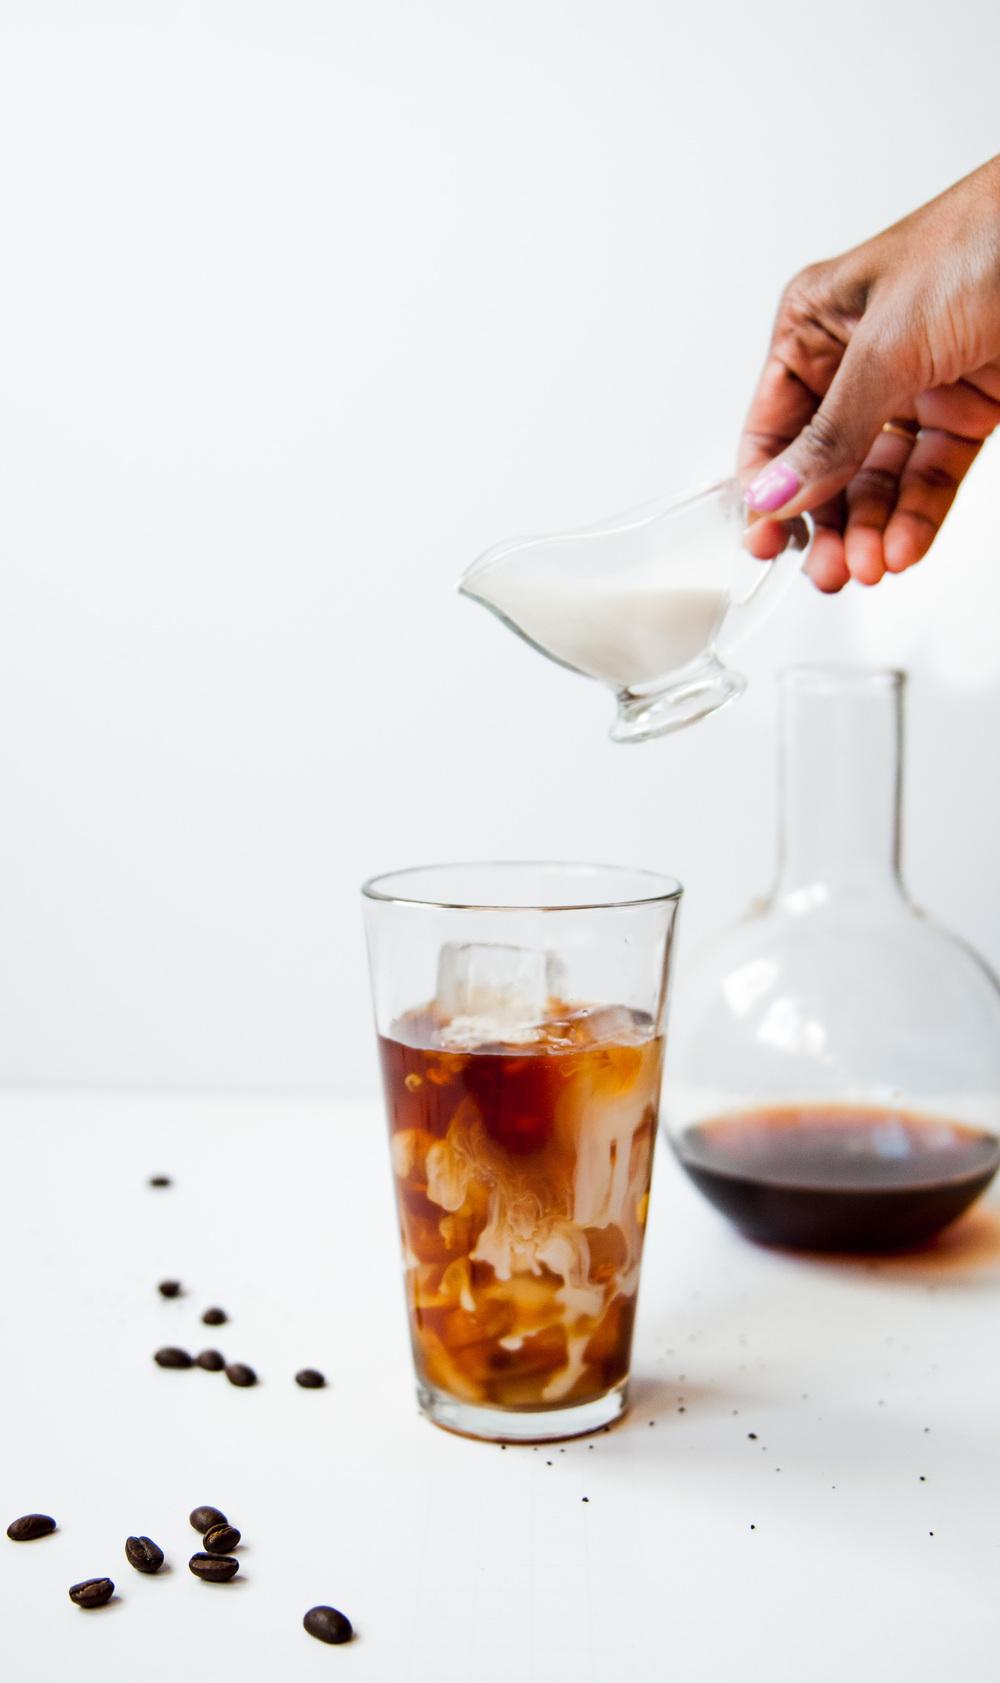 COLD BREW FRENCH PRESS COFFEE